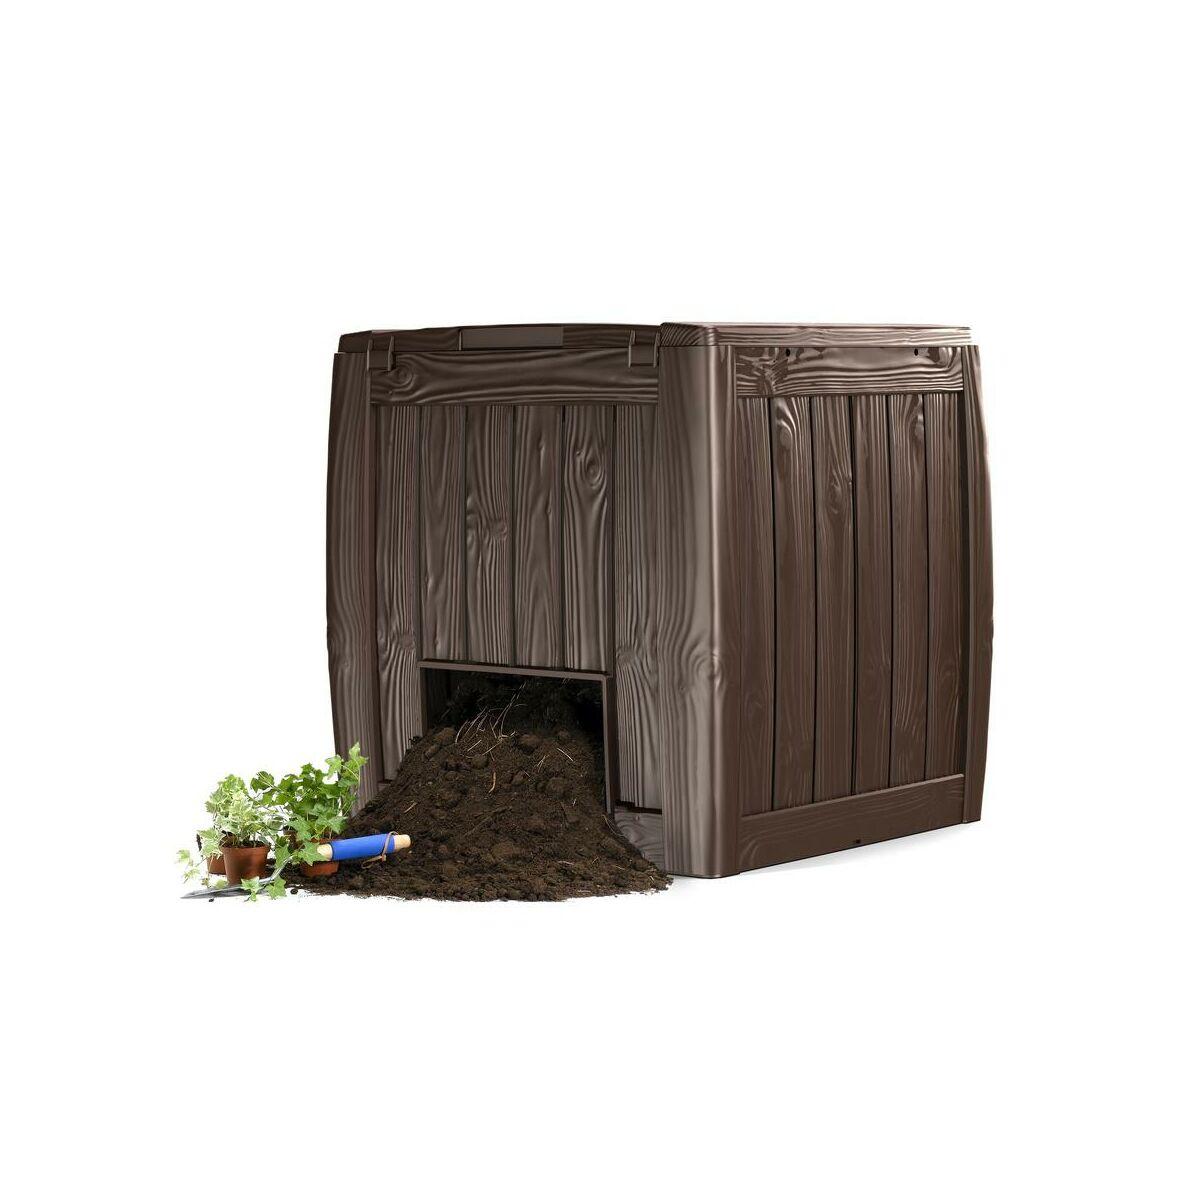 kompostownik deco 340 l keter kompostowniki w atrakcyjnej cenie w sklepach leroy merlin. Black Bedroom Furniture Sets. Home Design Ideas